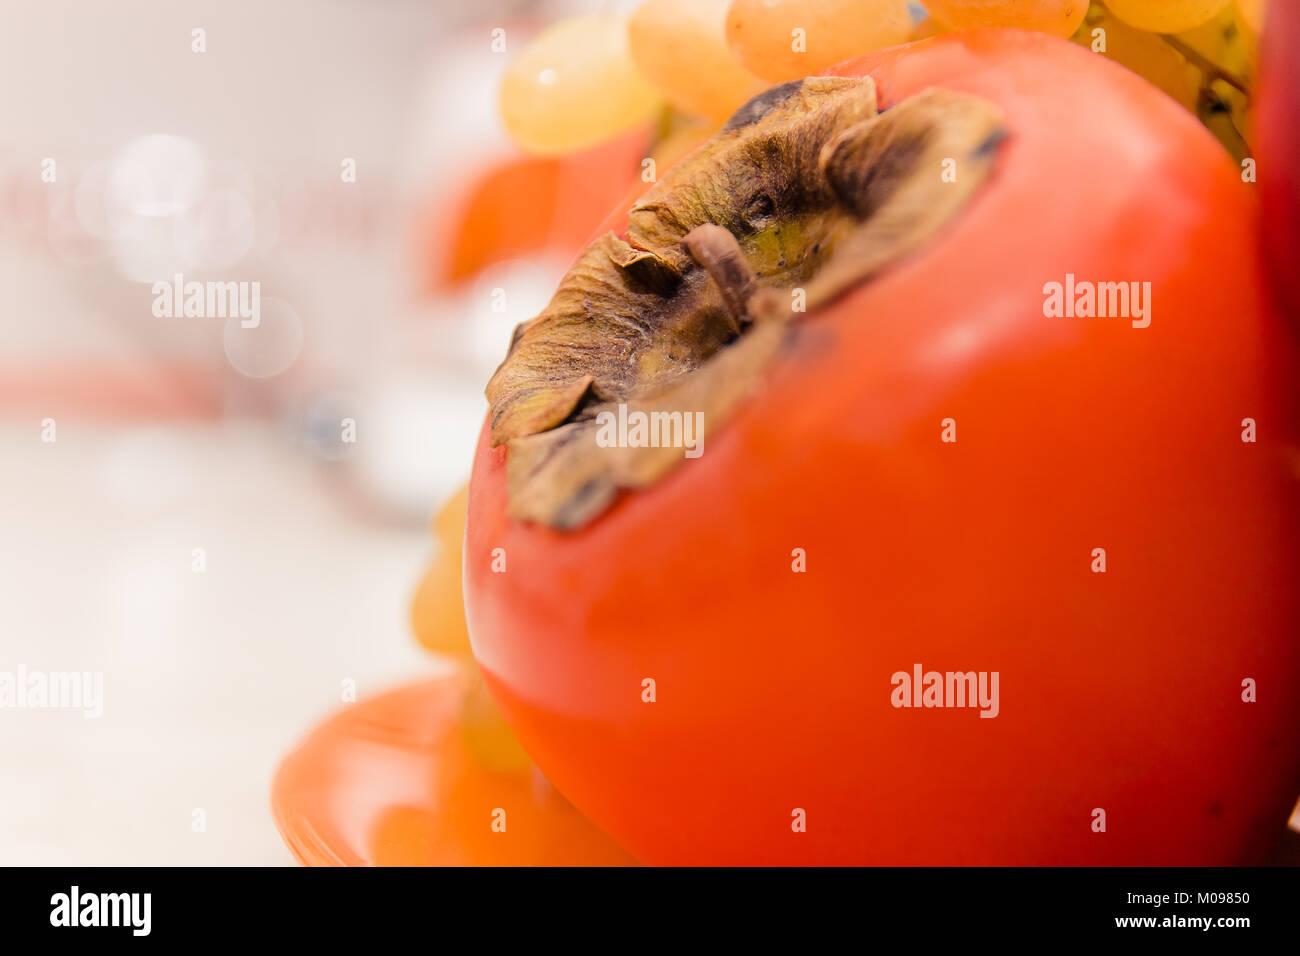 orange ripe persimmon closeup - Stock Image